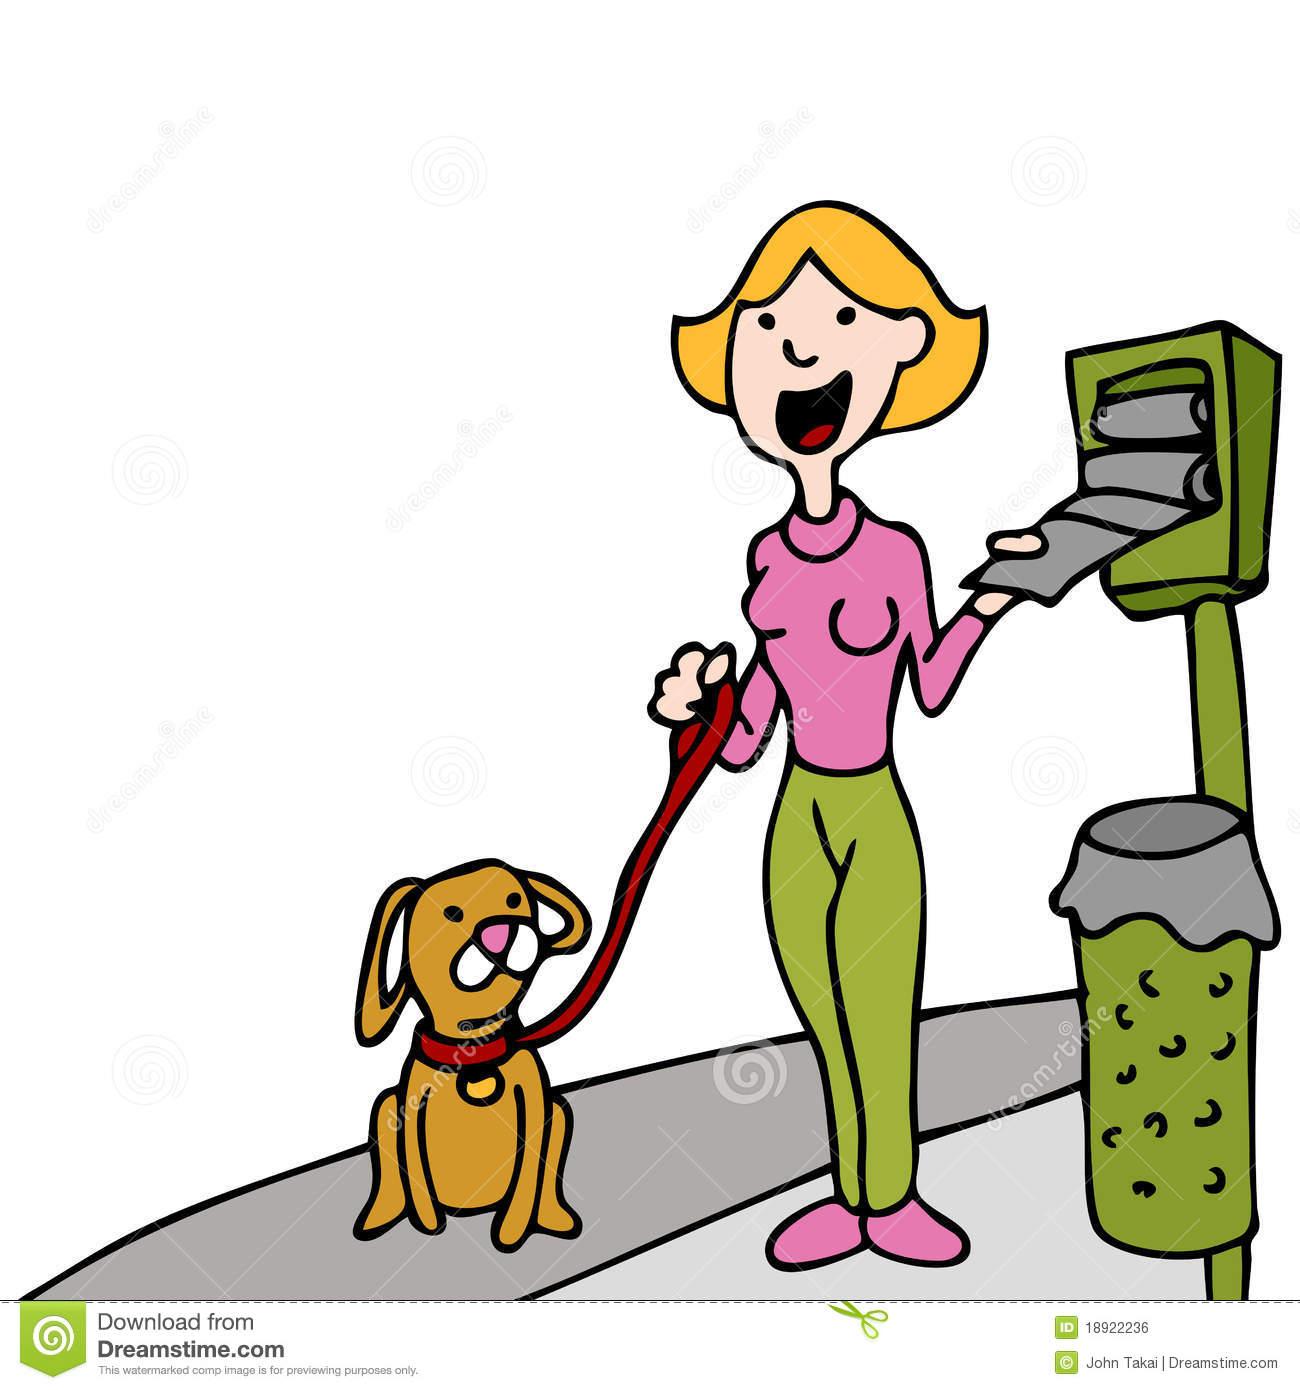 Pet Waste Clipart - Clipart Kid